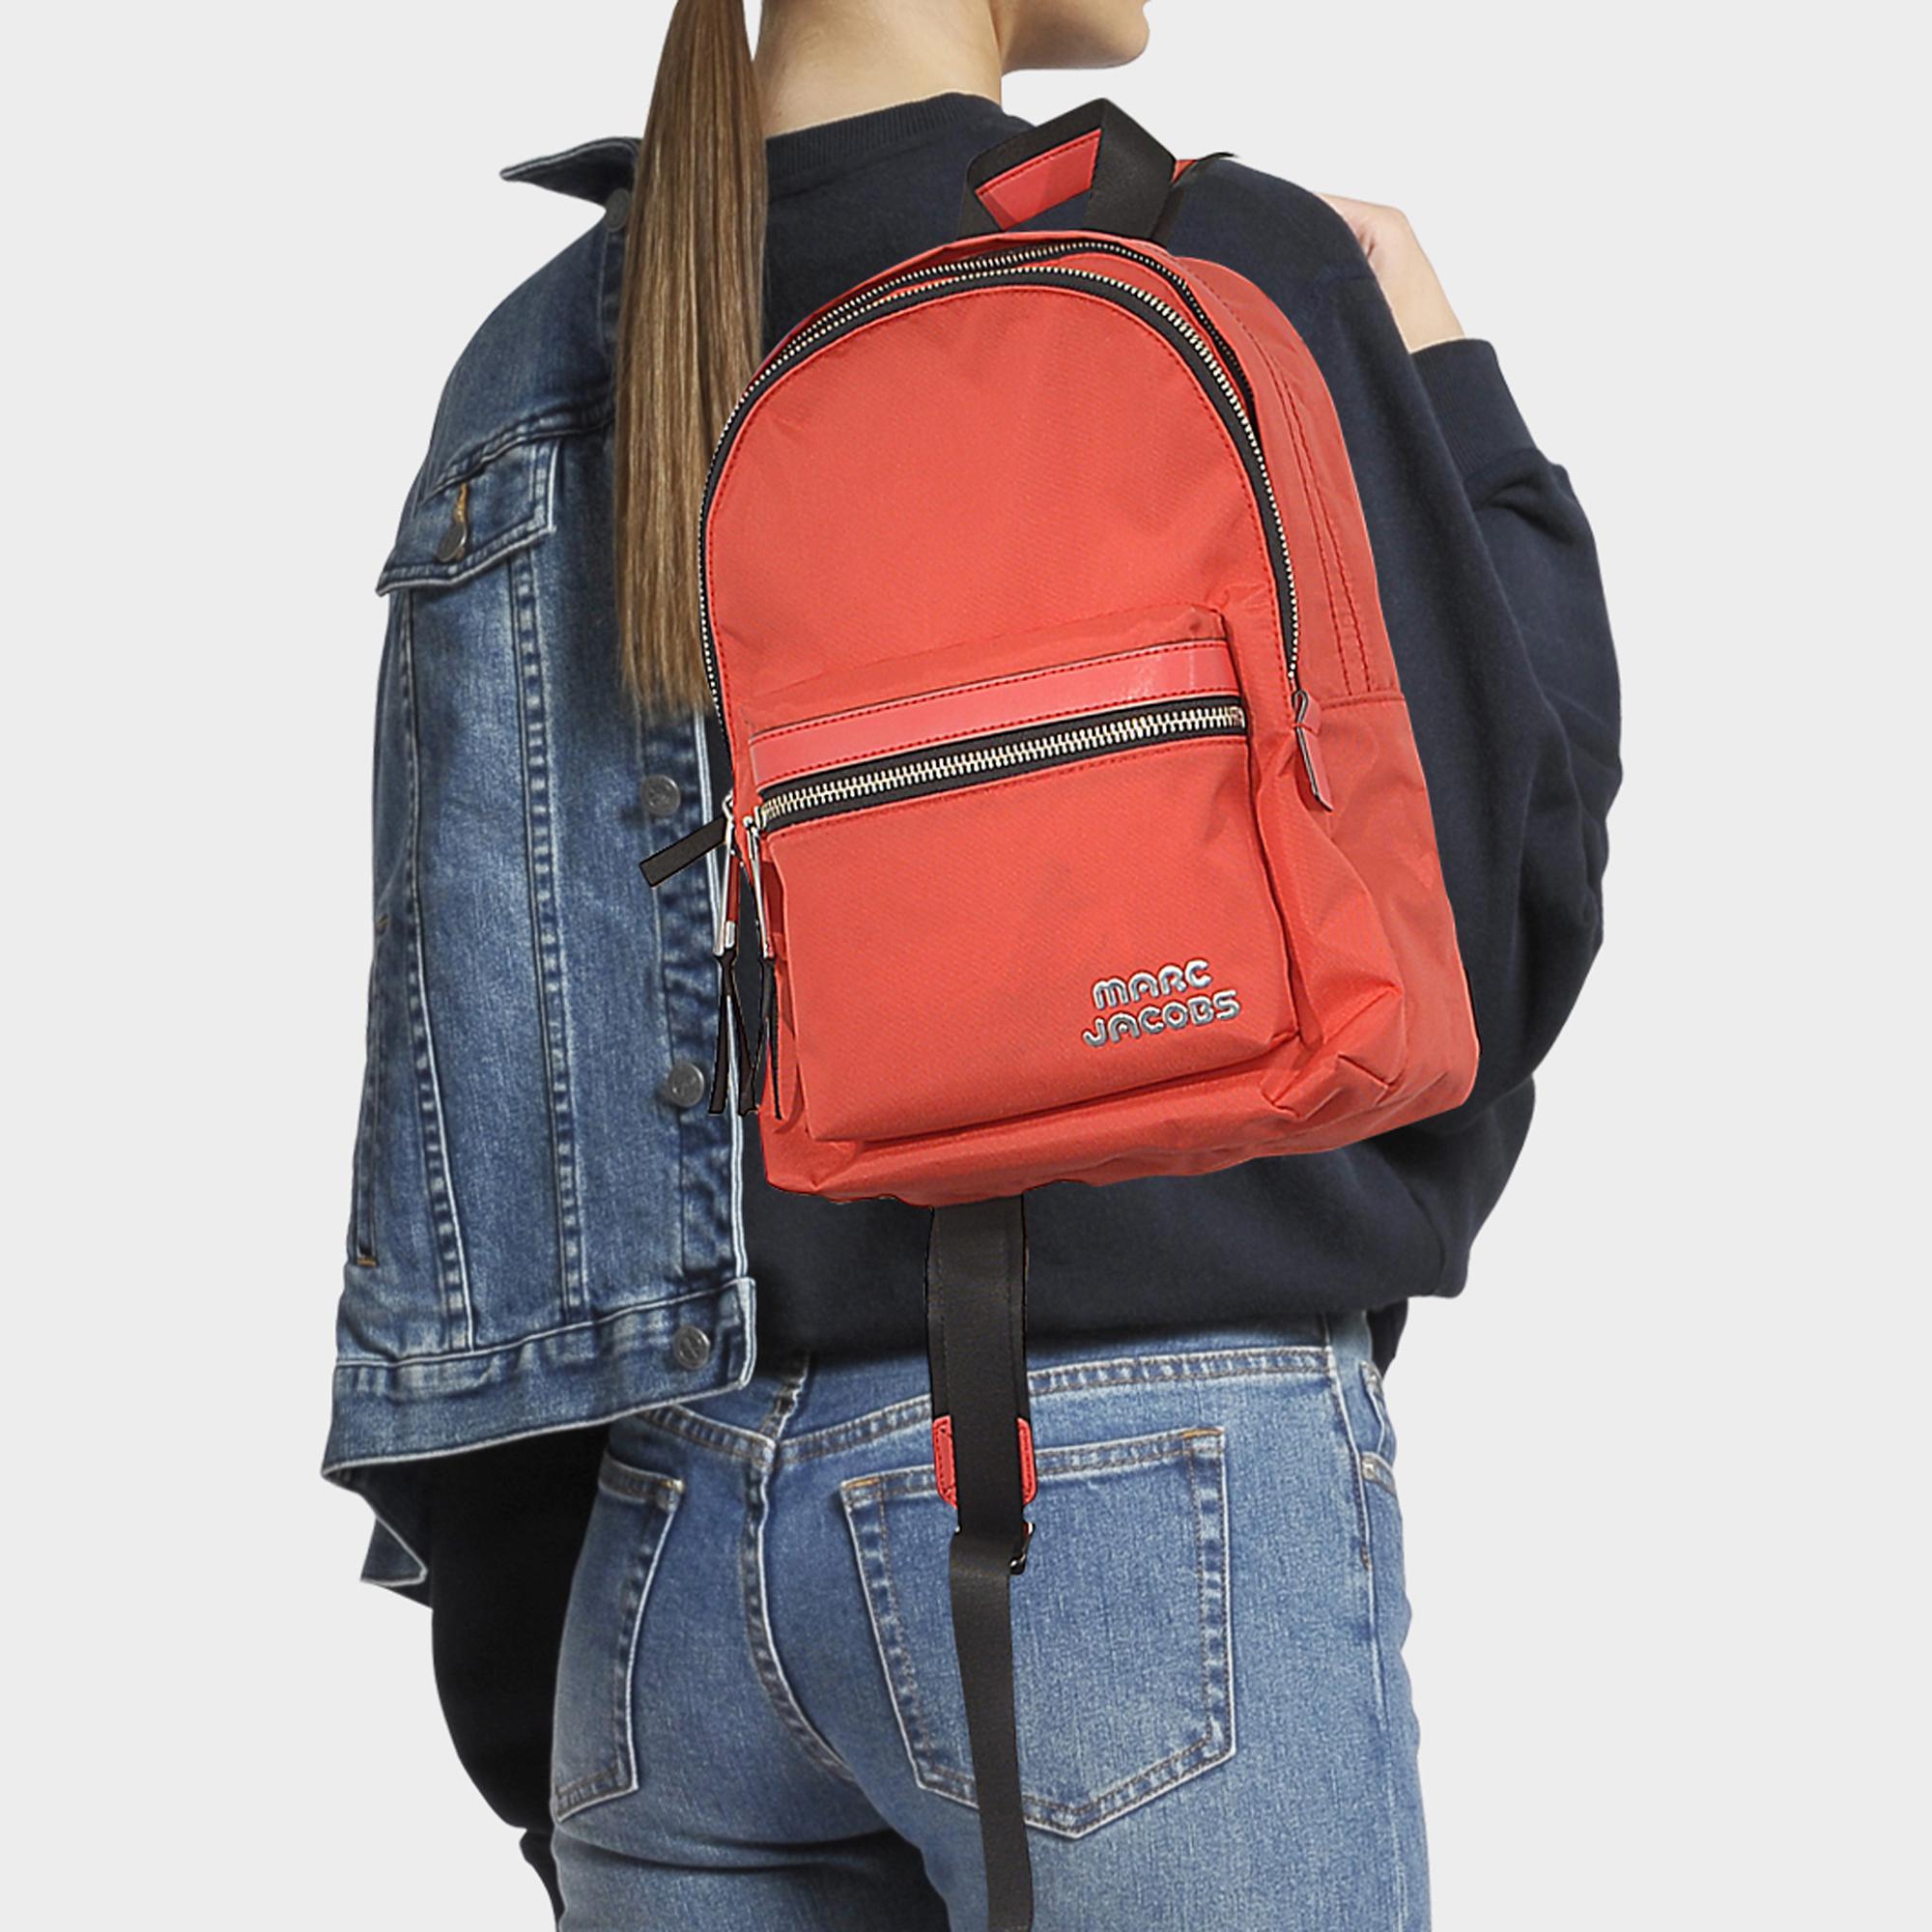 Marc Jacobs Medium Trek Pack Backpack In Poppy Red Nylon in Red - Lyst 487fc1ca2561f